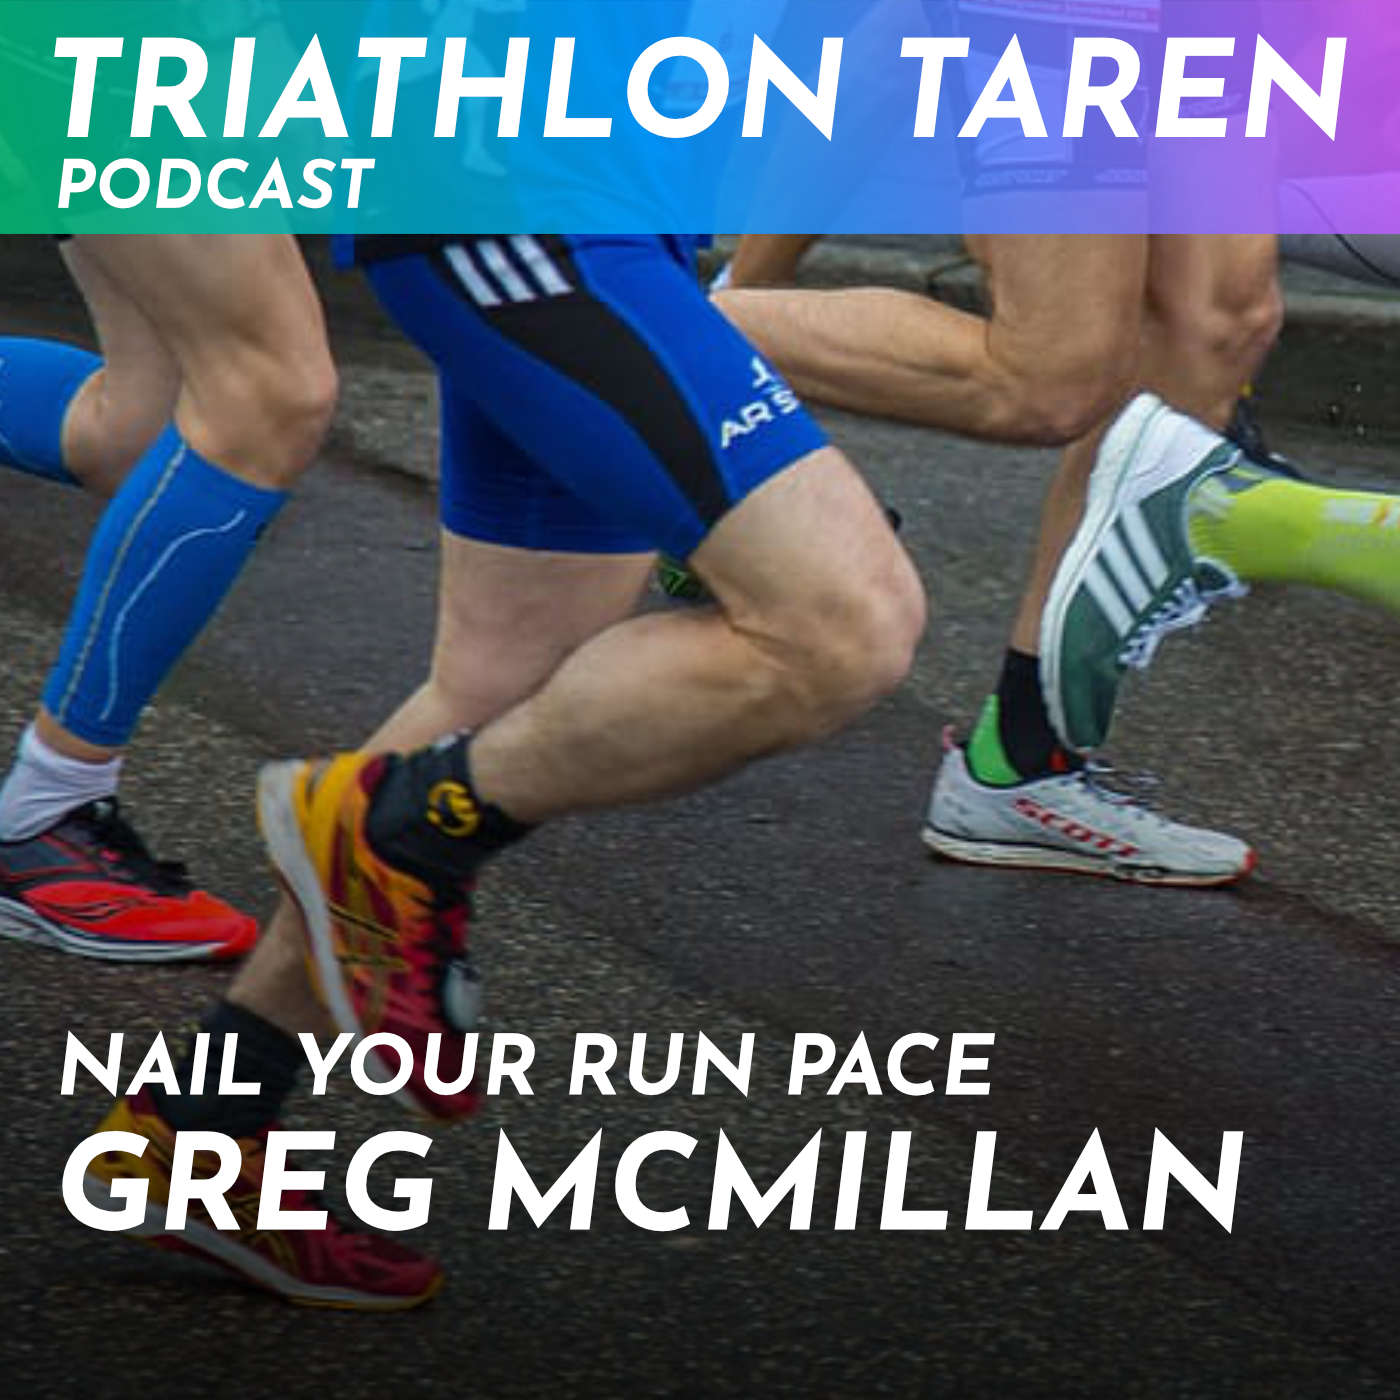 How to Nail Your Run Pacing with the Run Pacing Guru Greg McMillan